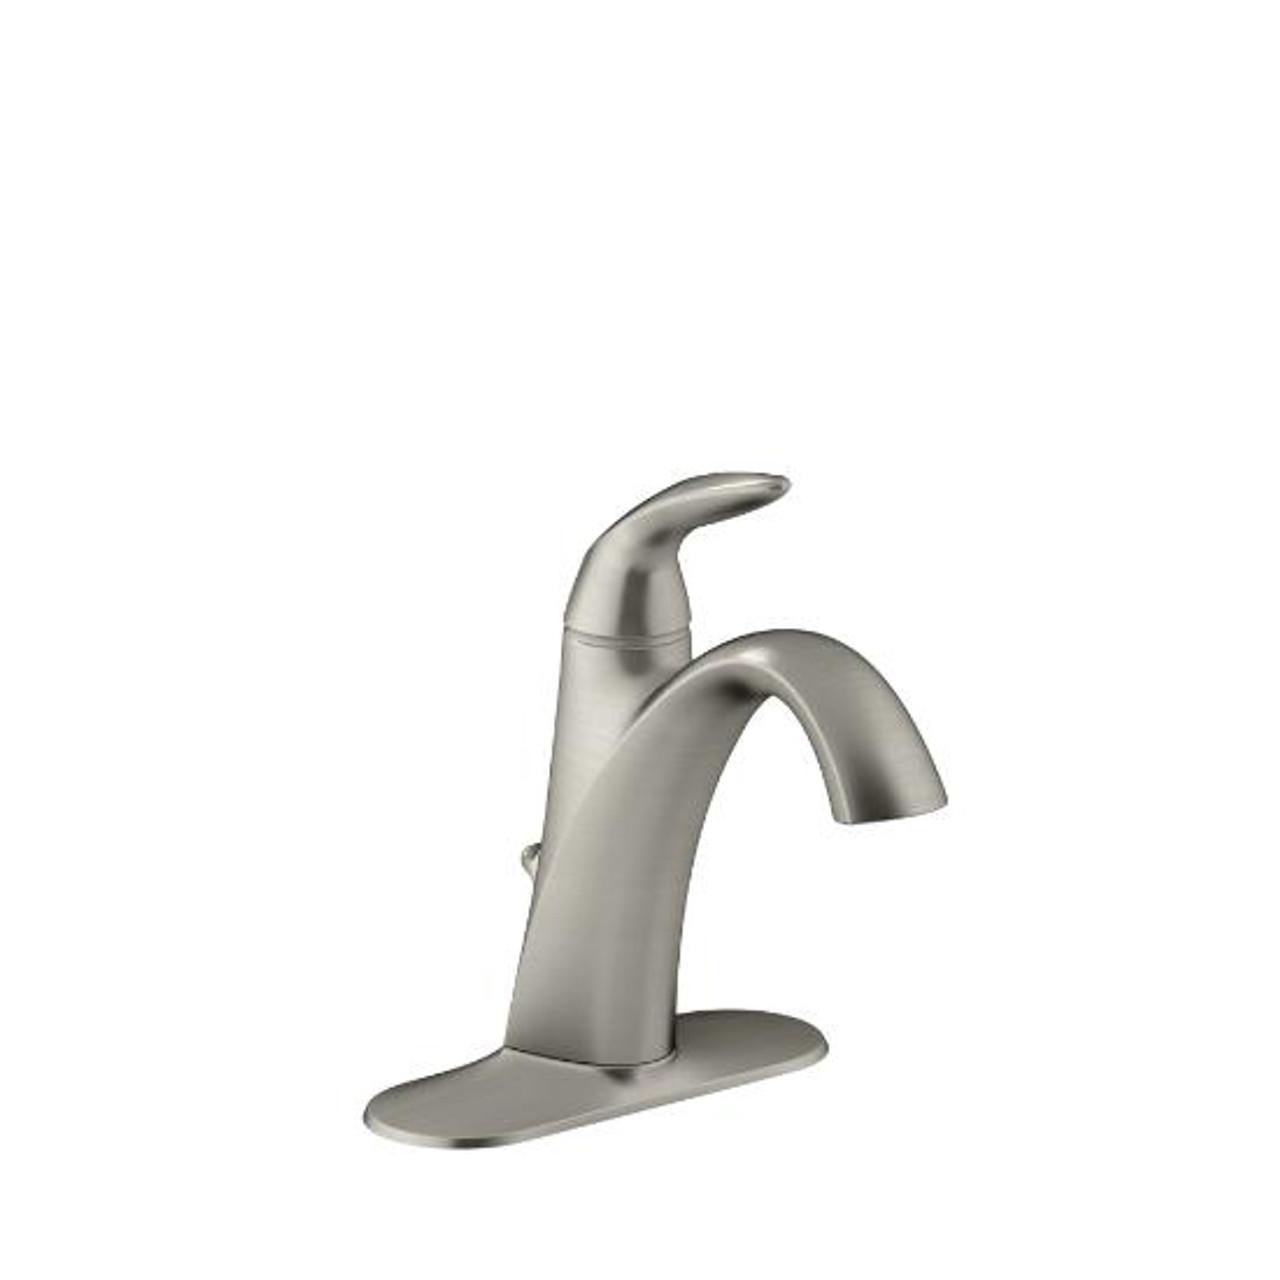 kohler alteo single handle bathroom sink faucet k 45800 4